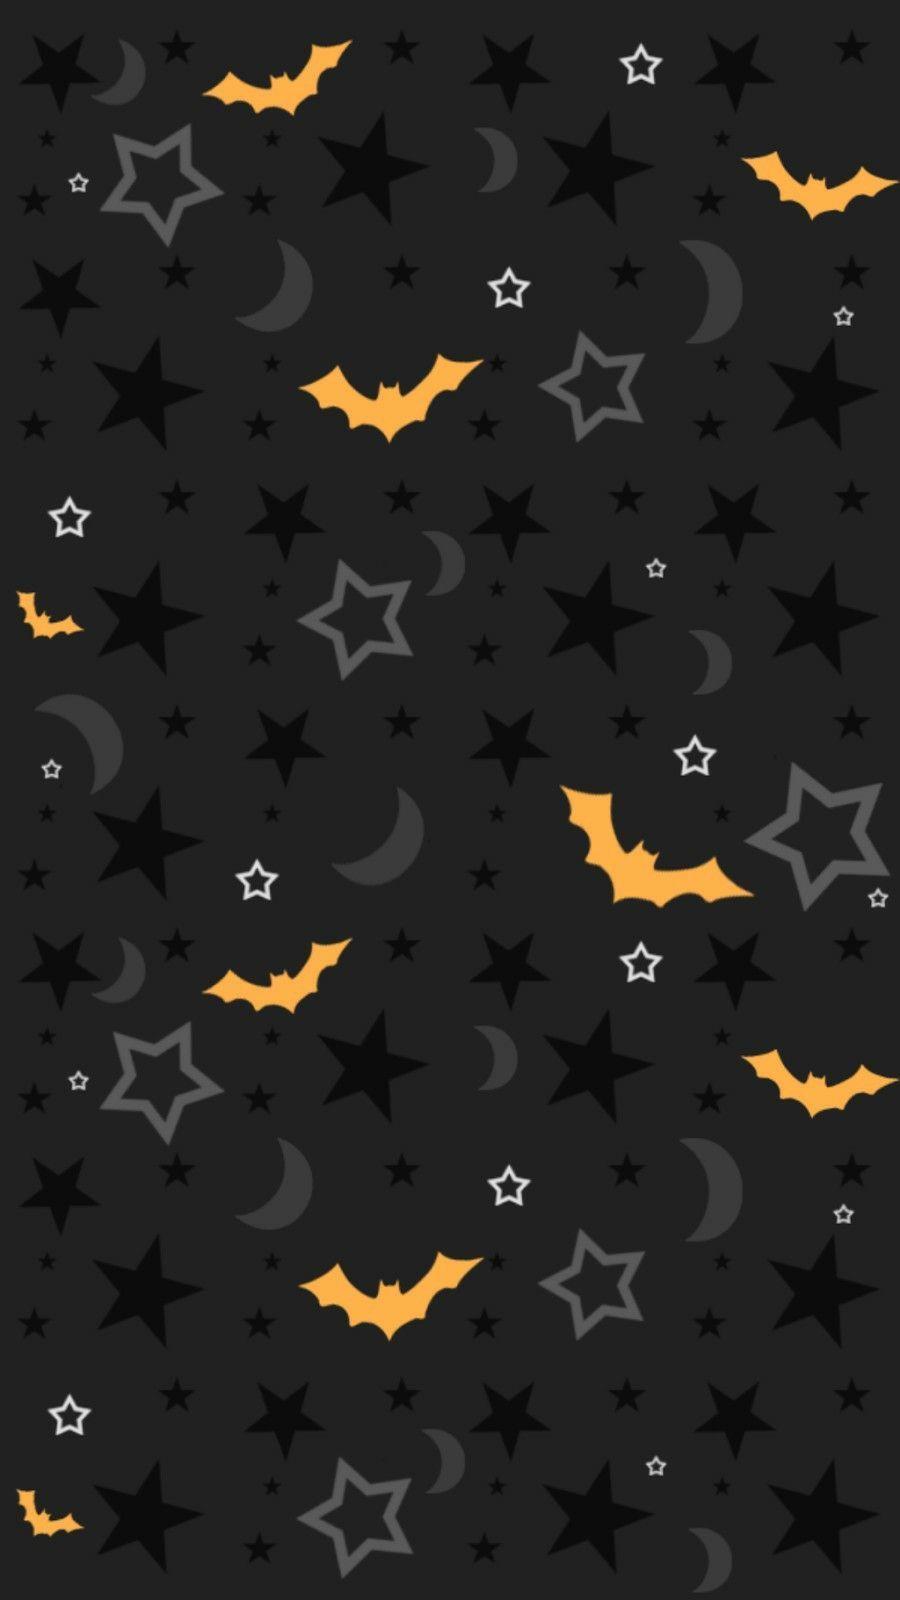 Halloween Iphone Wallpapers Top Free Halloween Iphone Backgrounds Wallpaperaccess